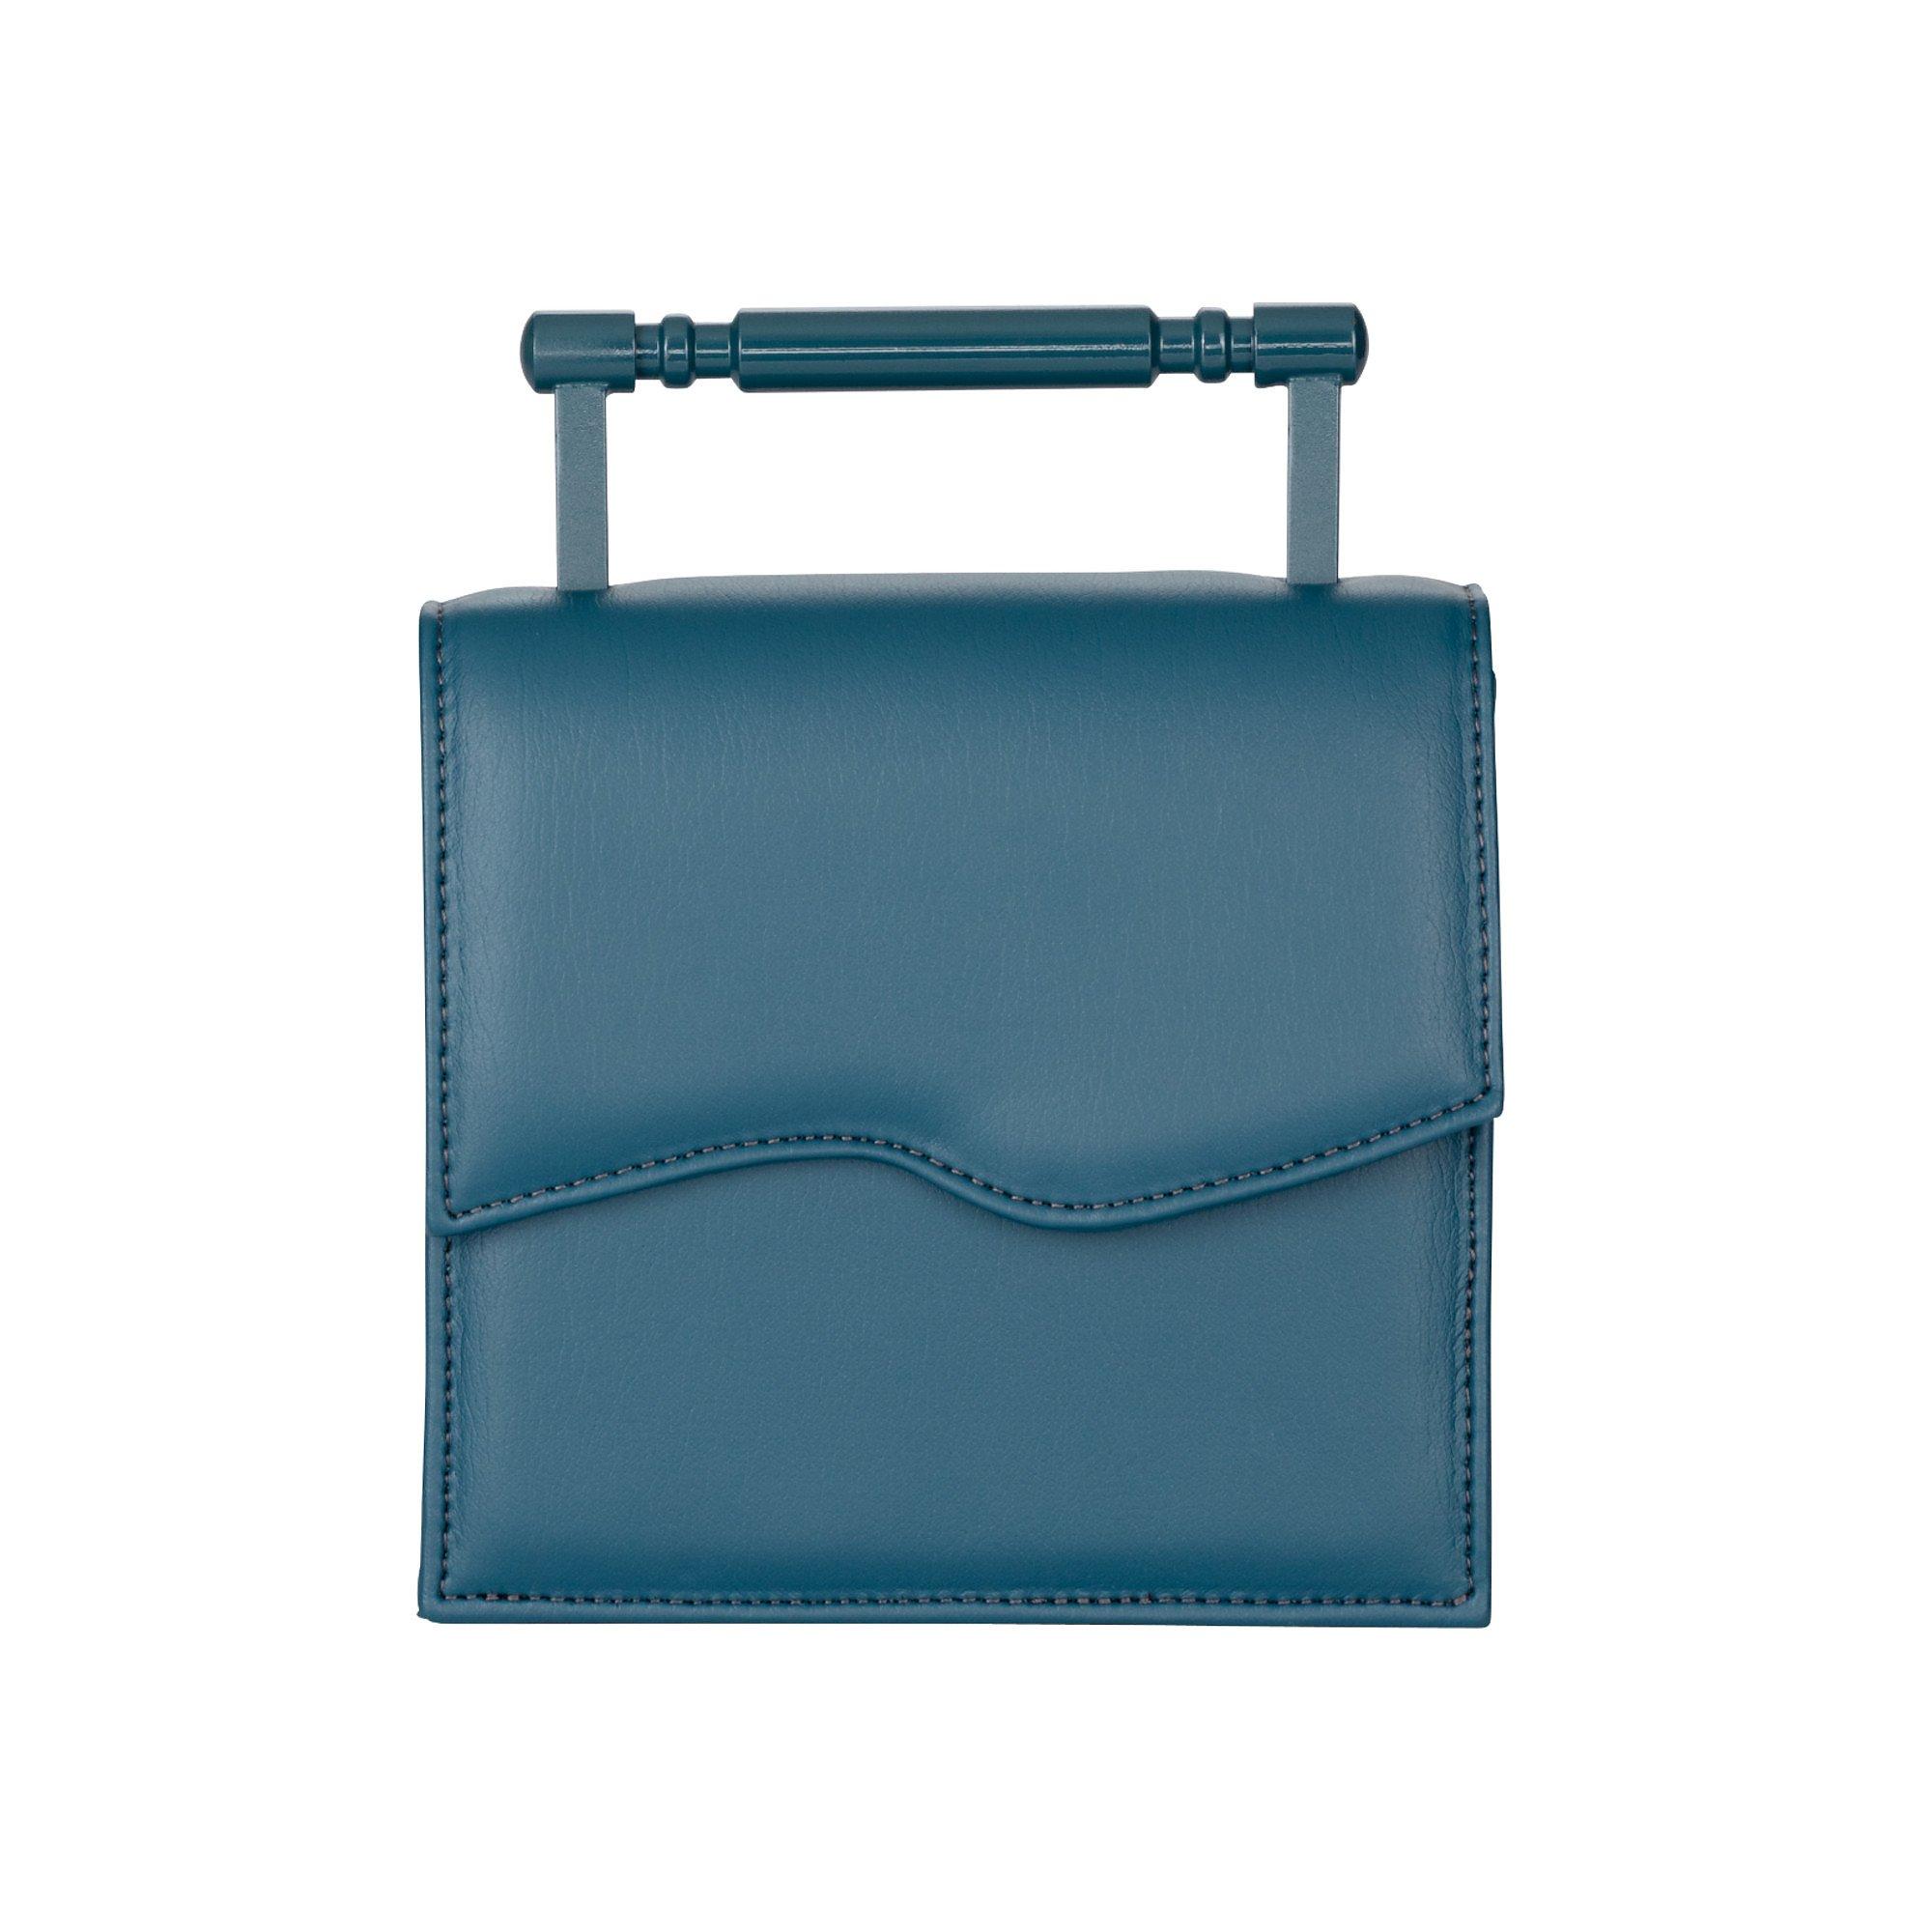 Mashu Iris Ocean Bag